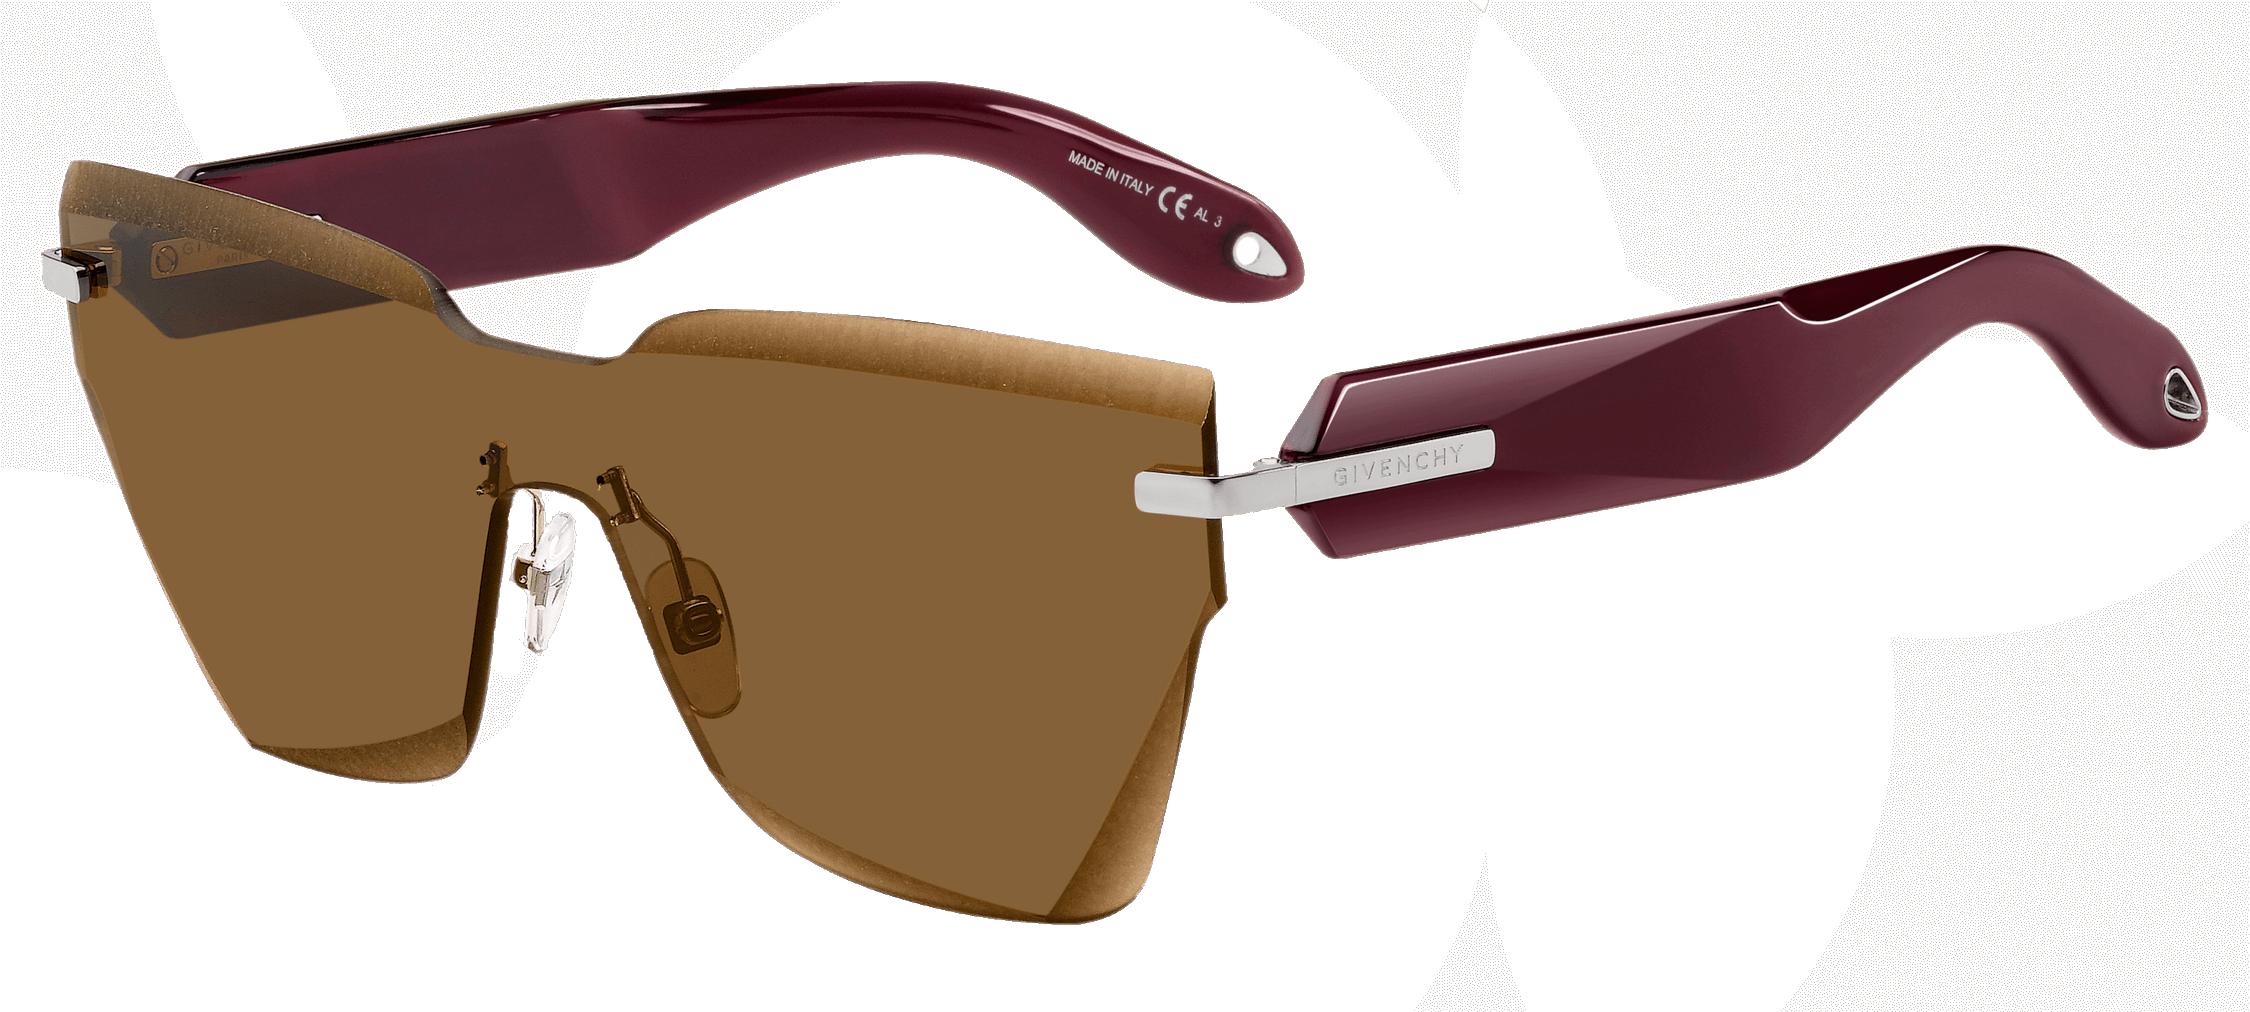 Givenchy Shield Sunglasses 2